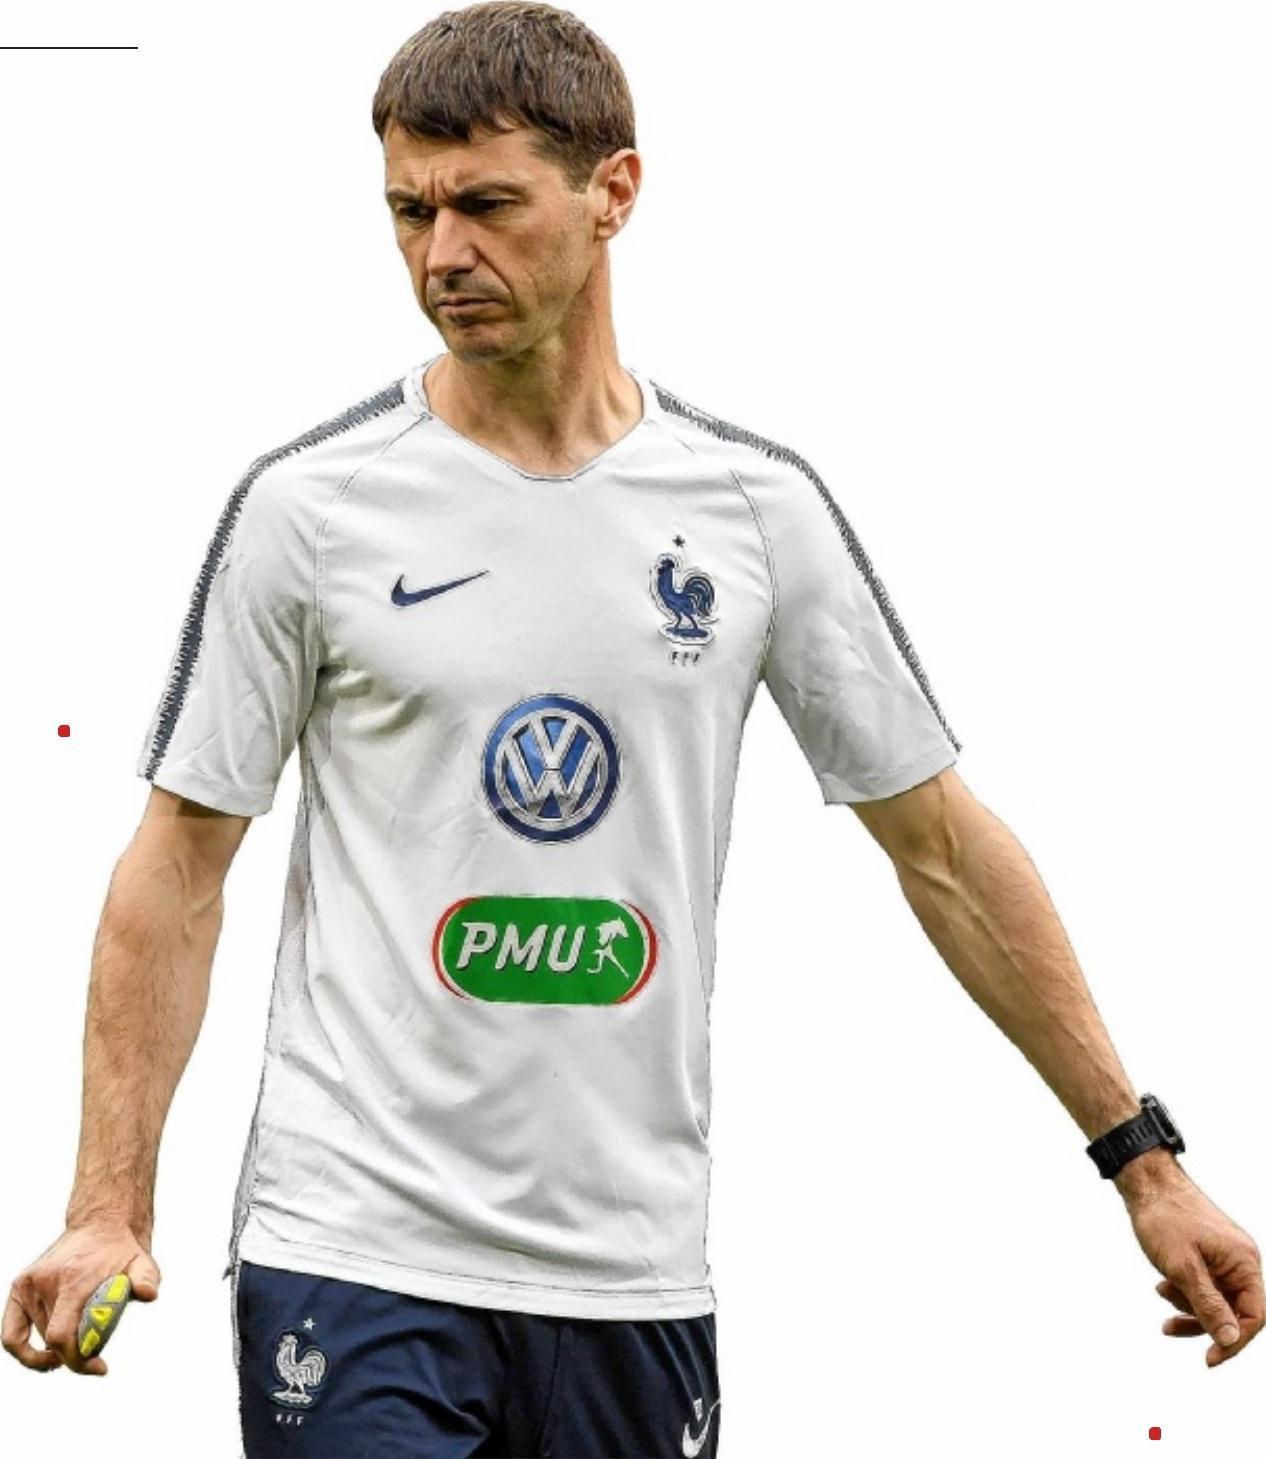 À ISTRA, RICHARD GOTTE,sports@lavoixdunord.fr